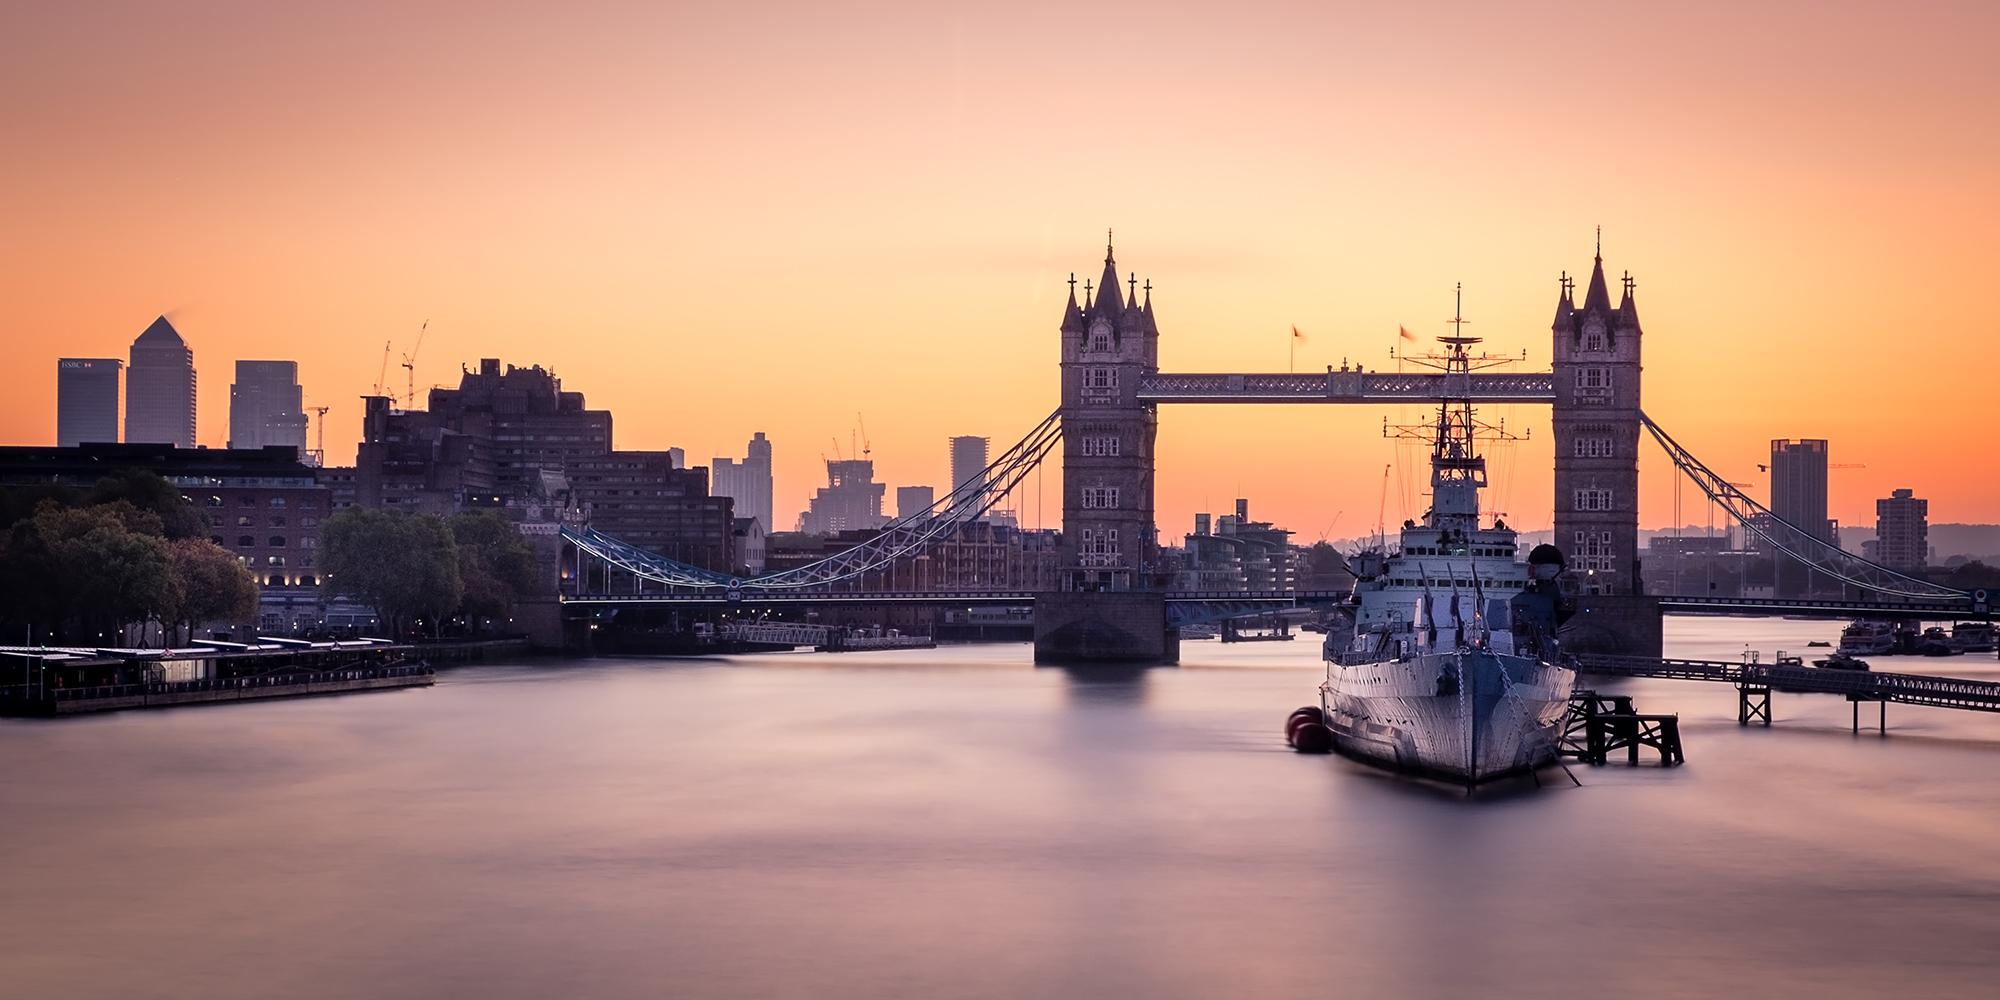 Photo of Tower Bridge at sunrise taken by Trevor Sherwin